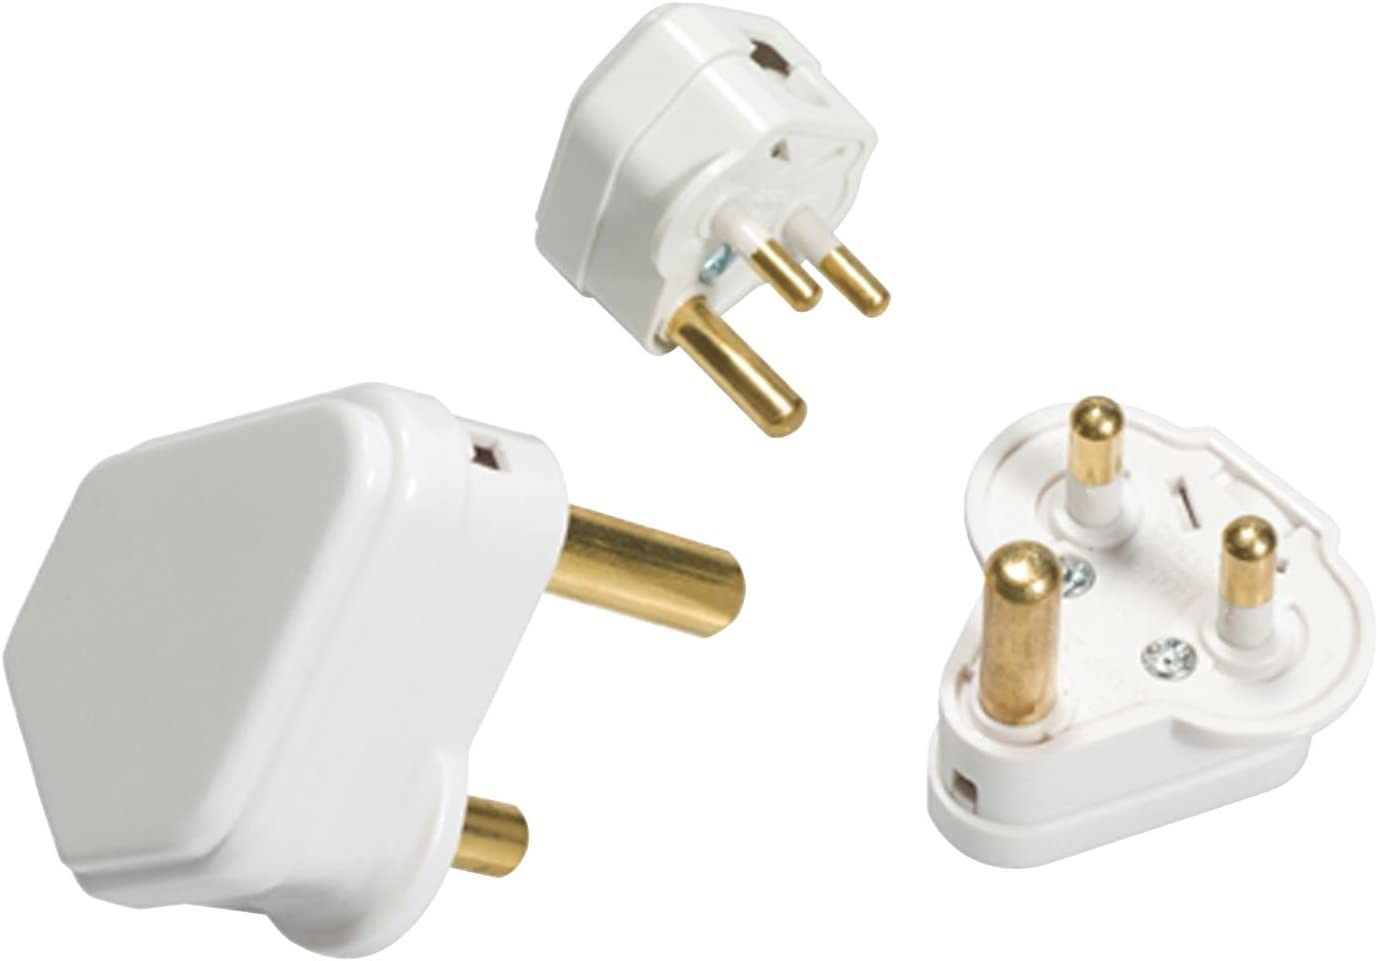 13 Amp Plug Top Fuse by Knightsbridge